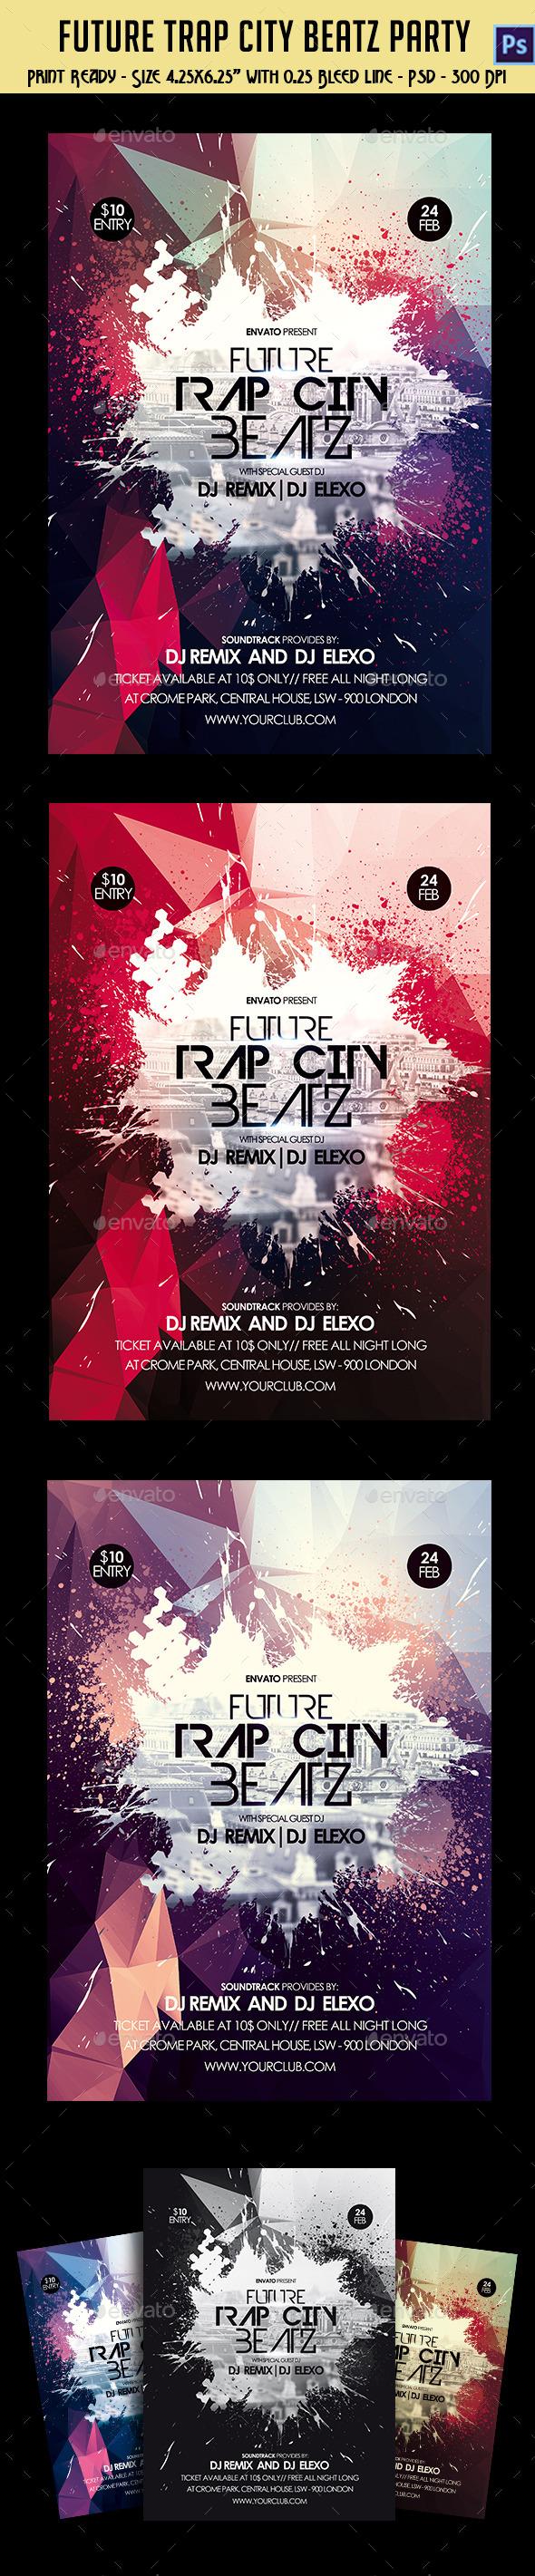 Future Trap City Beatz Party Flyer - Clubs & Parties Events